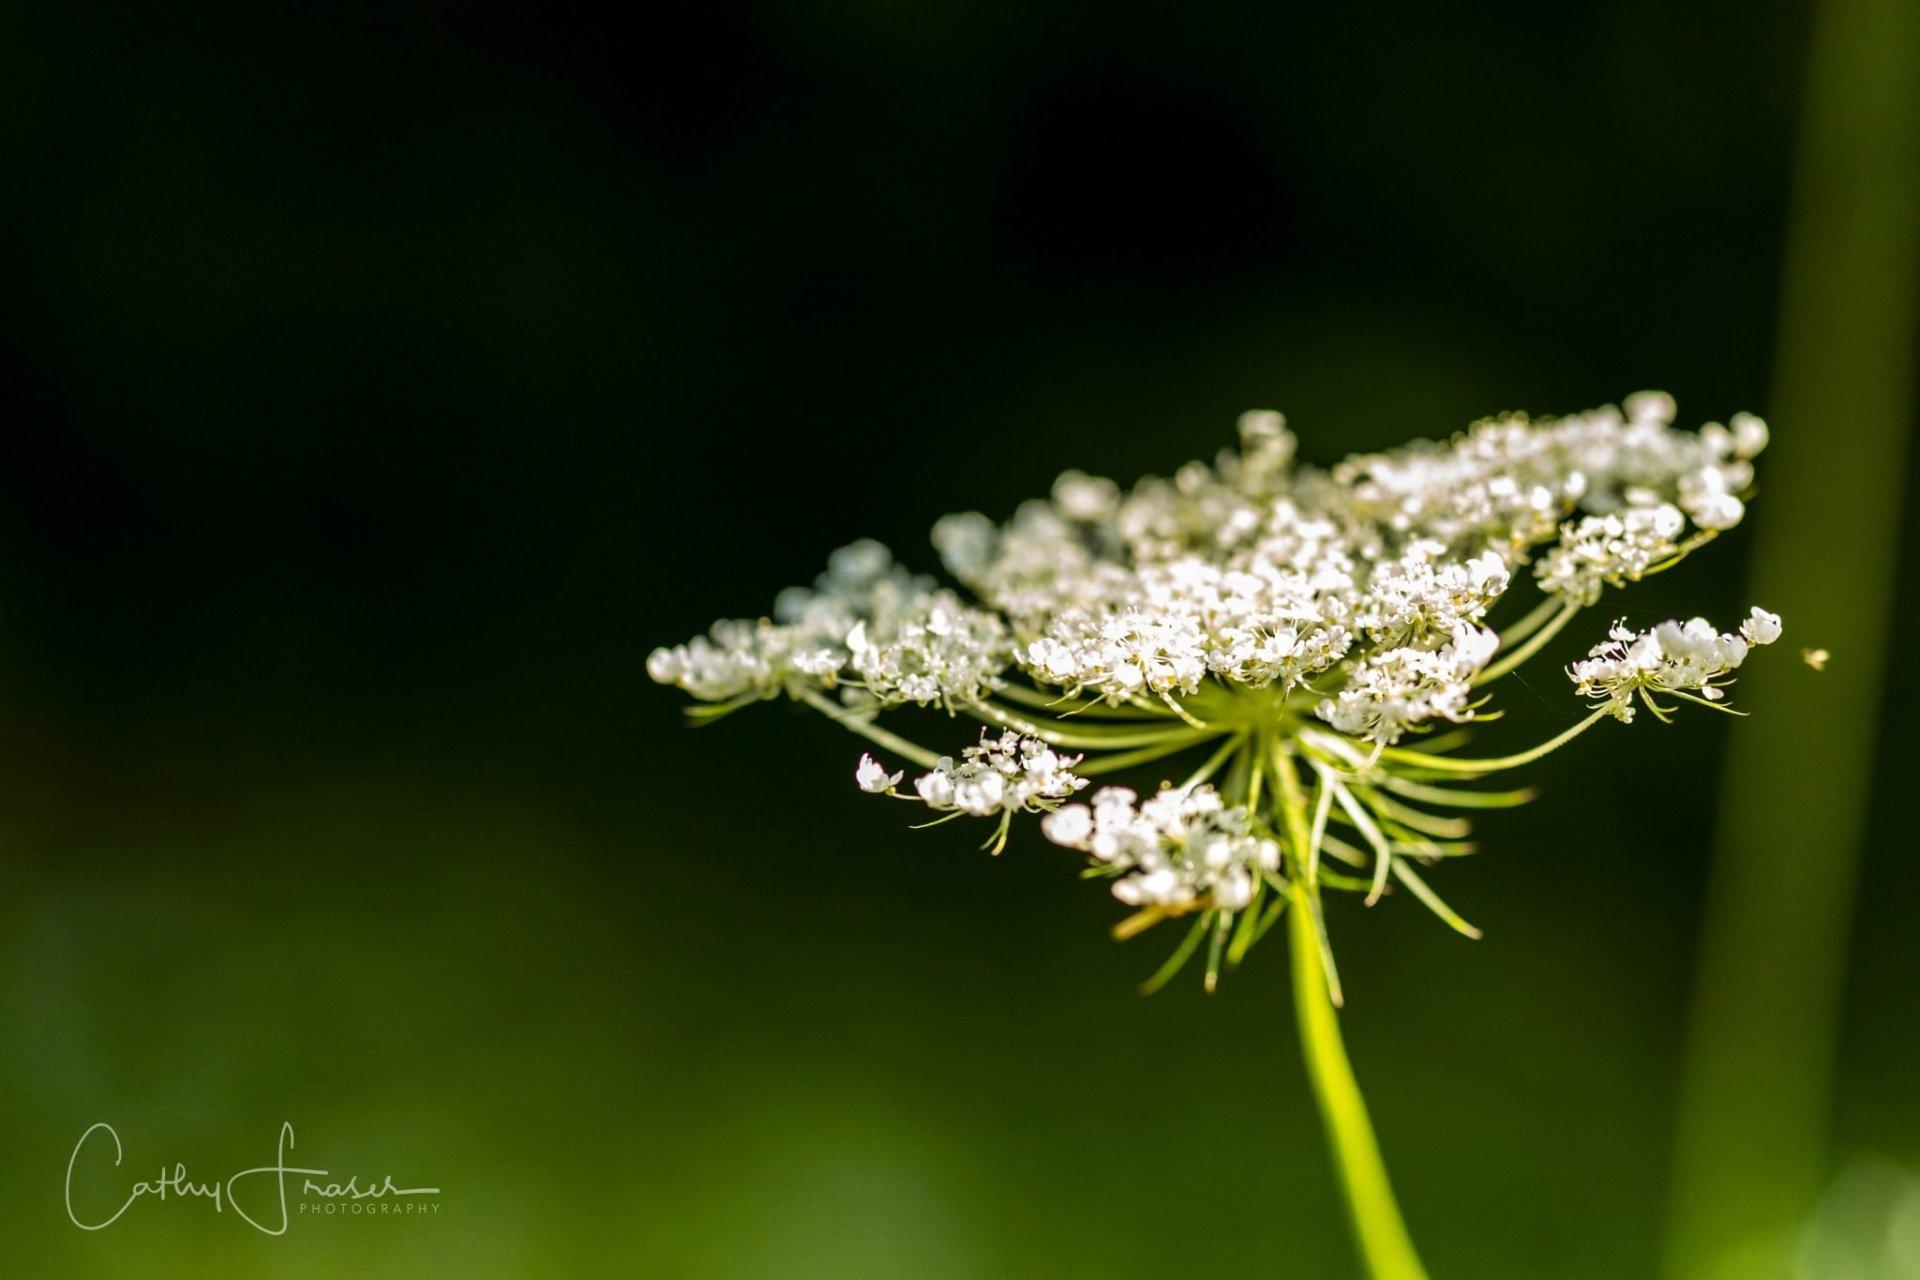 landscape photography of a flower